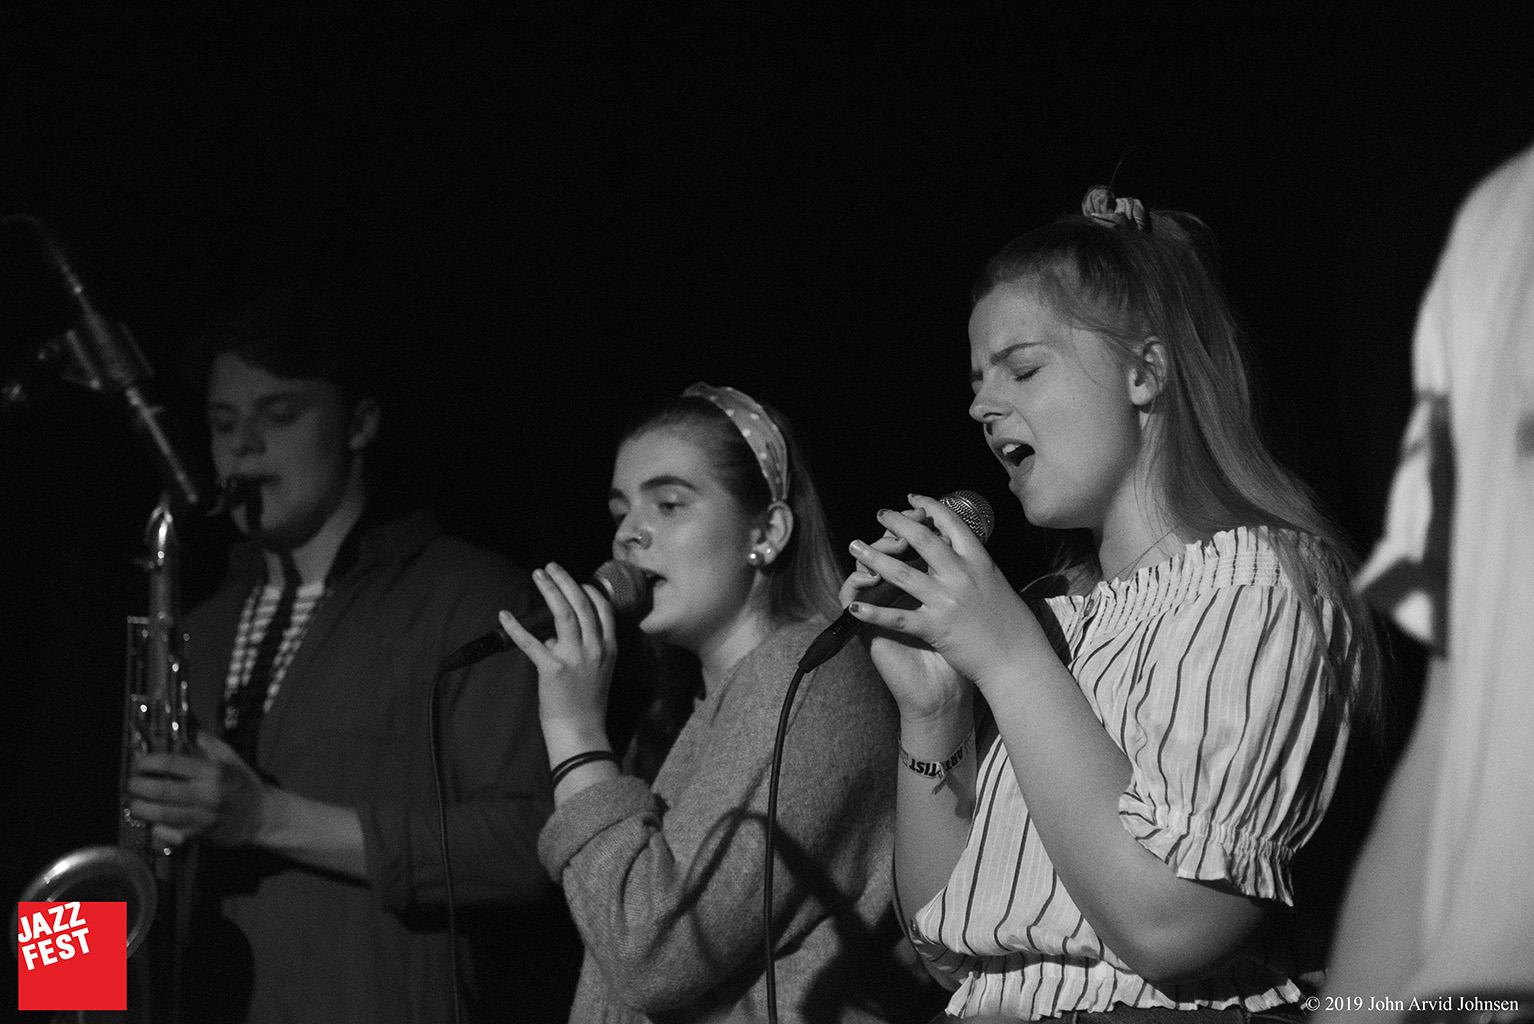 190509 Midtnorsk Ungdomsstorband (Jazzfest Future) @ Byscenen Anneks (foto John Arvid Johnsen) _ 3.jpg